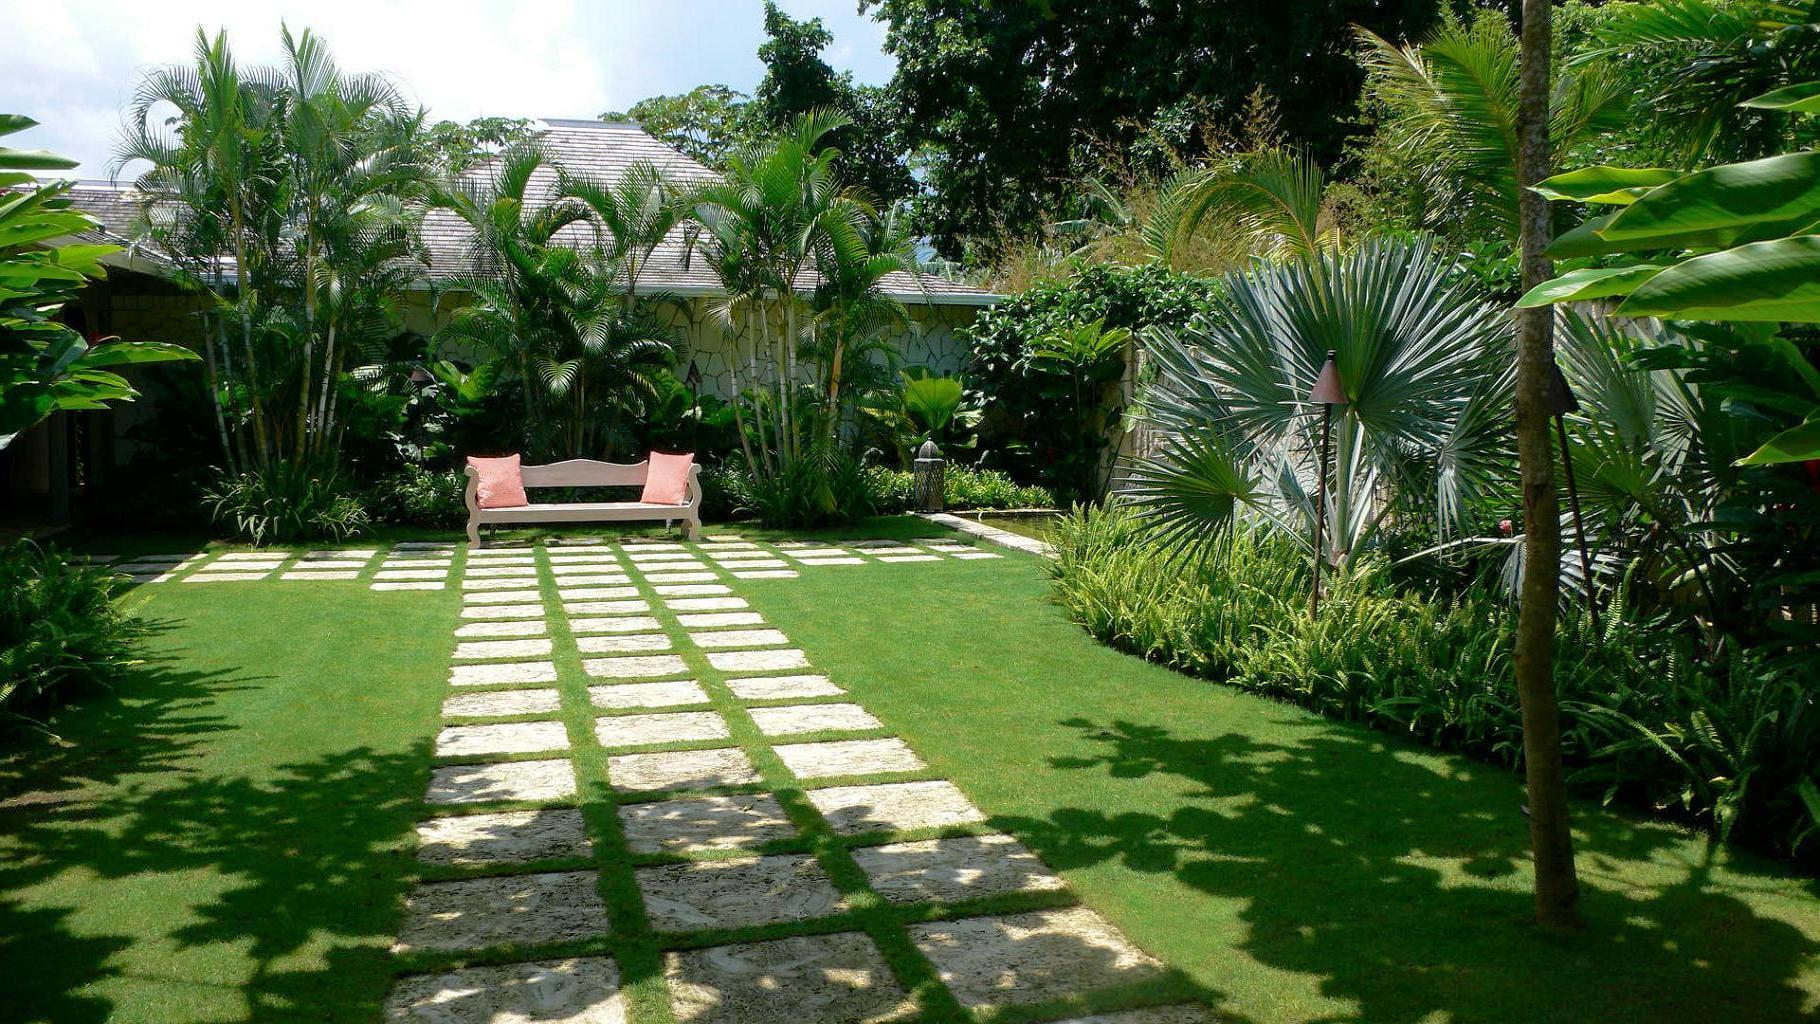 15.SIMPHOME.COM backyard landscape design app backyard landscape ideas southern within backyard landscape design tool